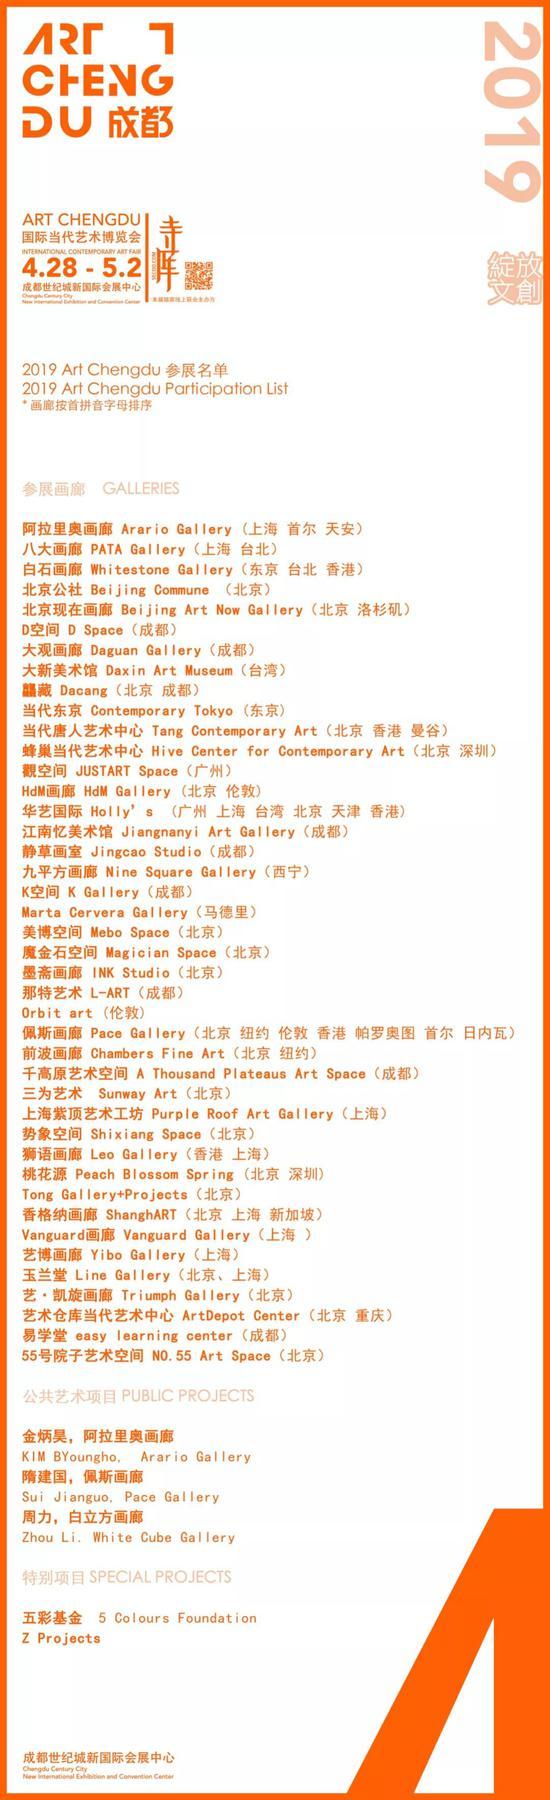 2019 Art Chengdu 参展画廊名单 GALLERIES画廊按拼音字母排序